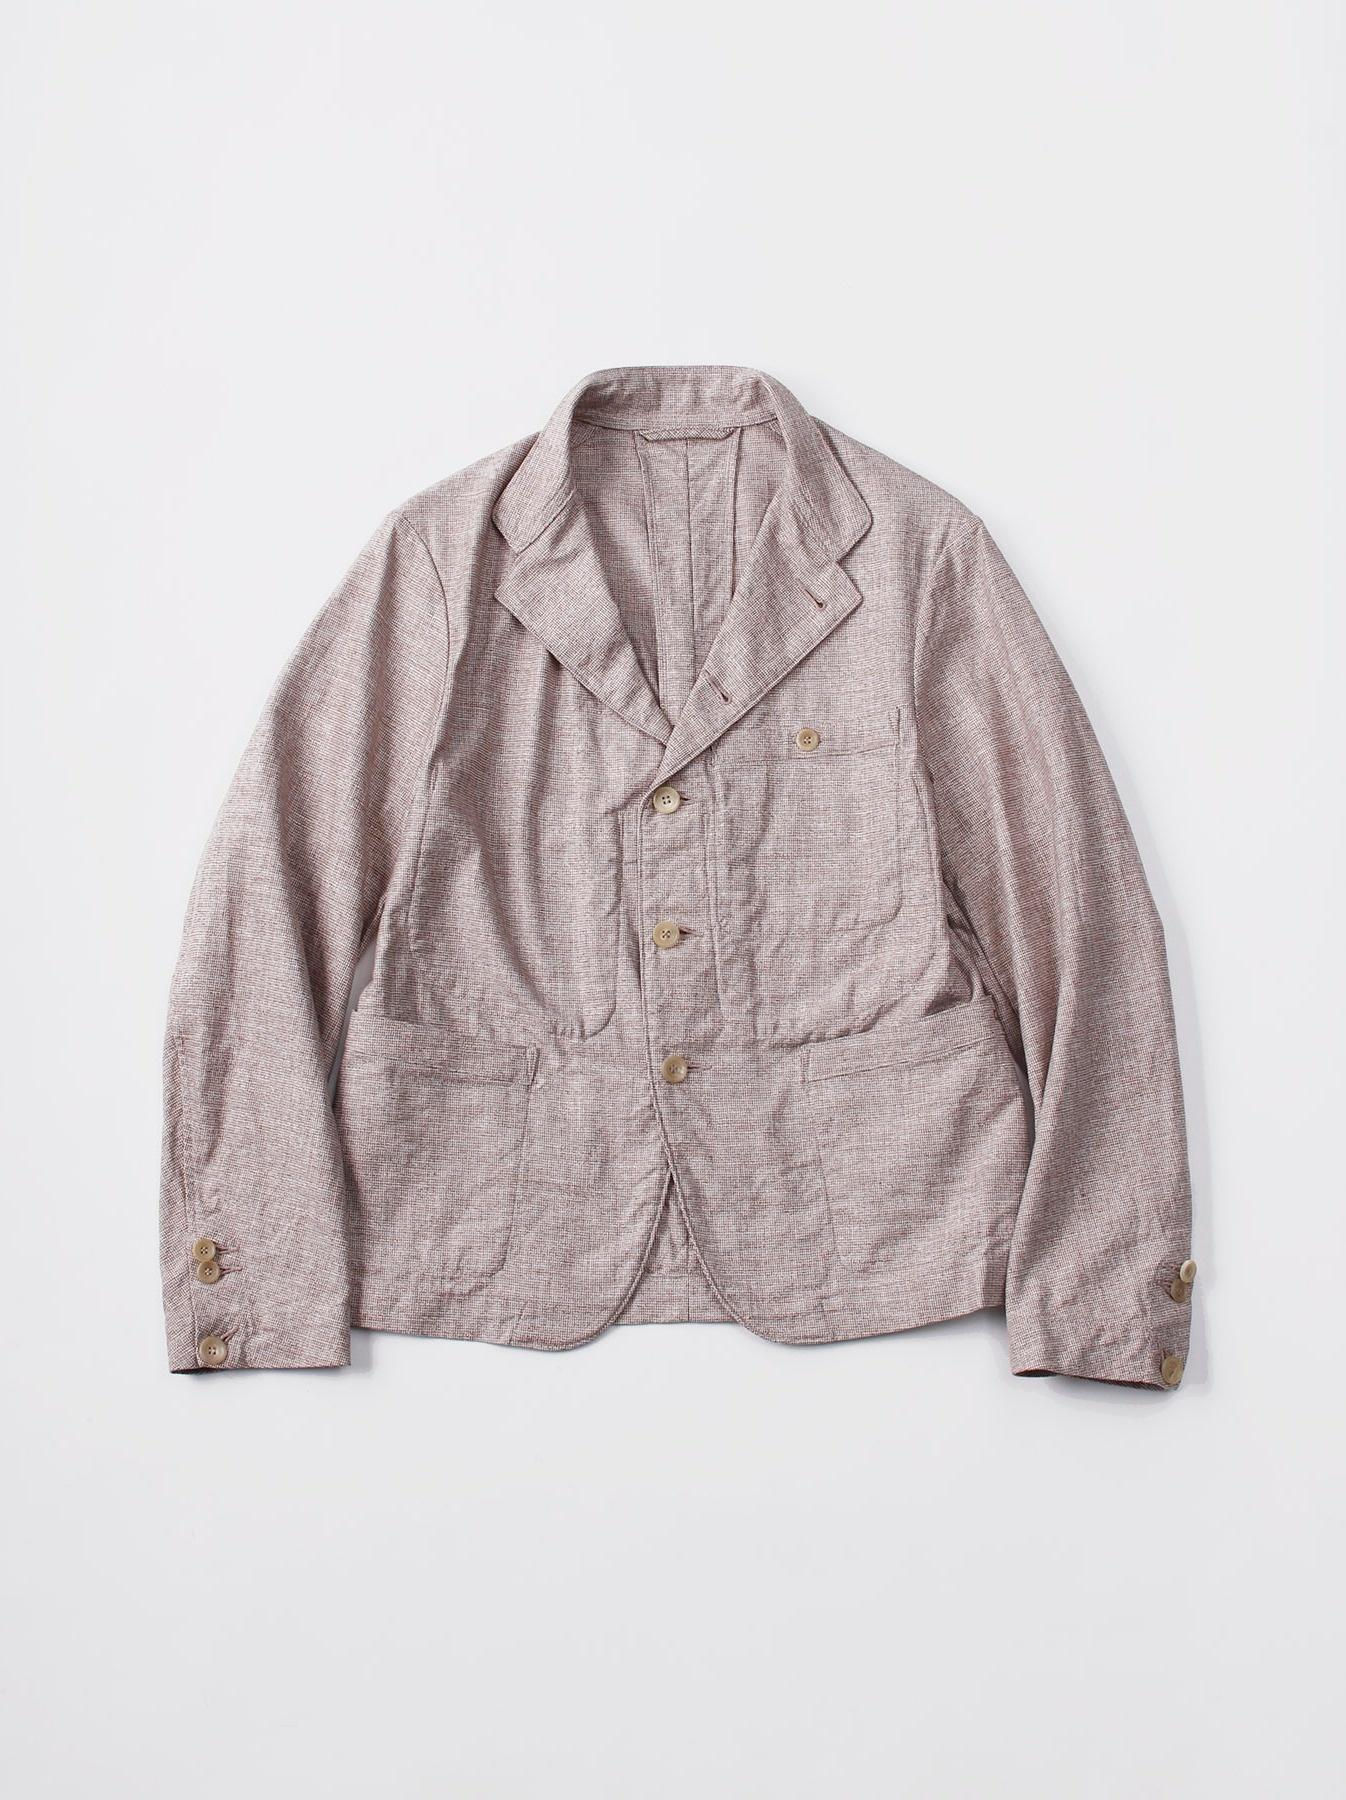 Cotton Tweed 908 Jacket-1